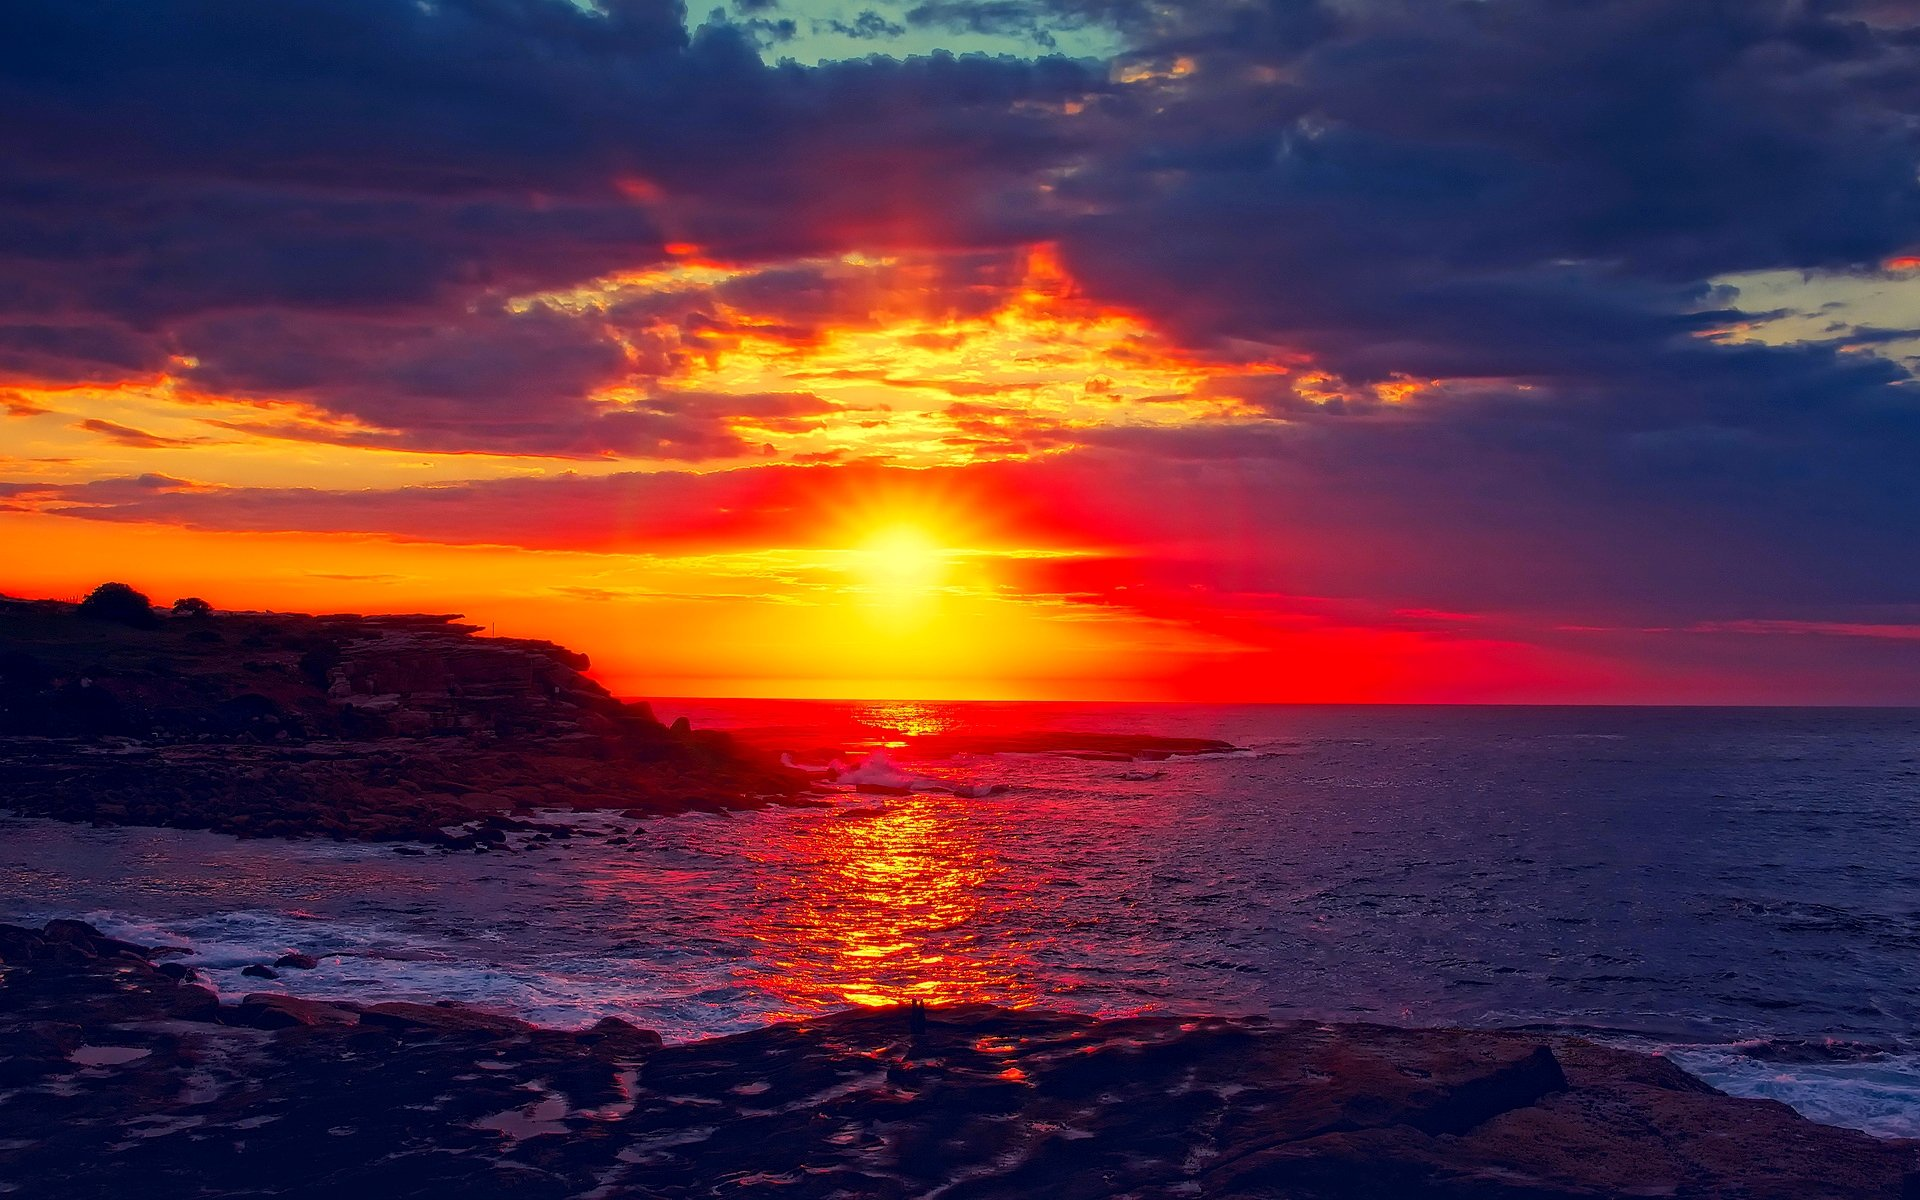 Summer Sunset Wallpaper - WallpaperSafari